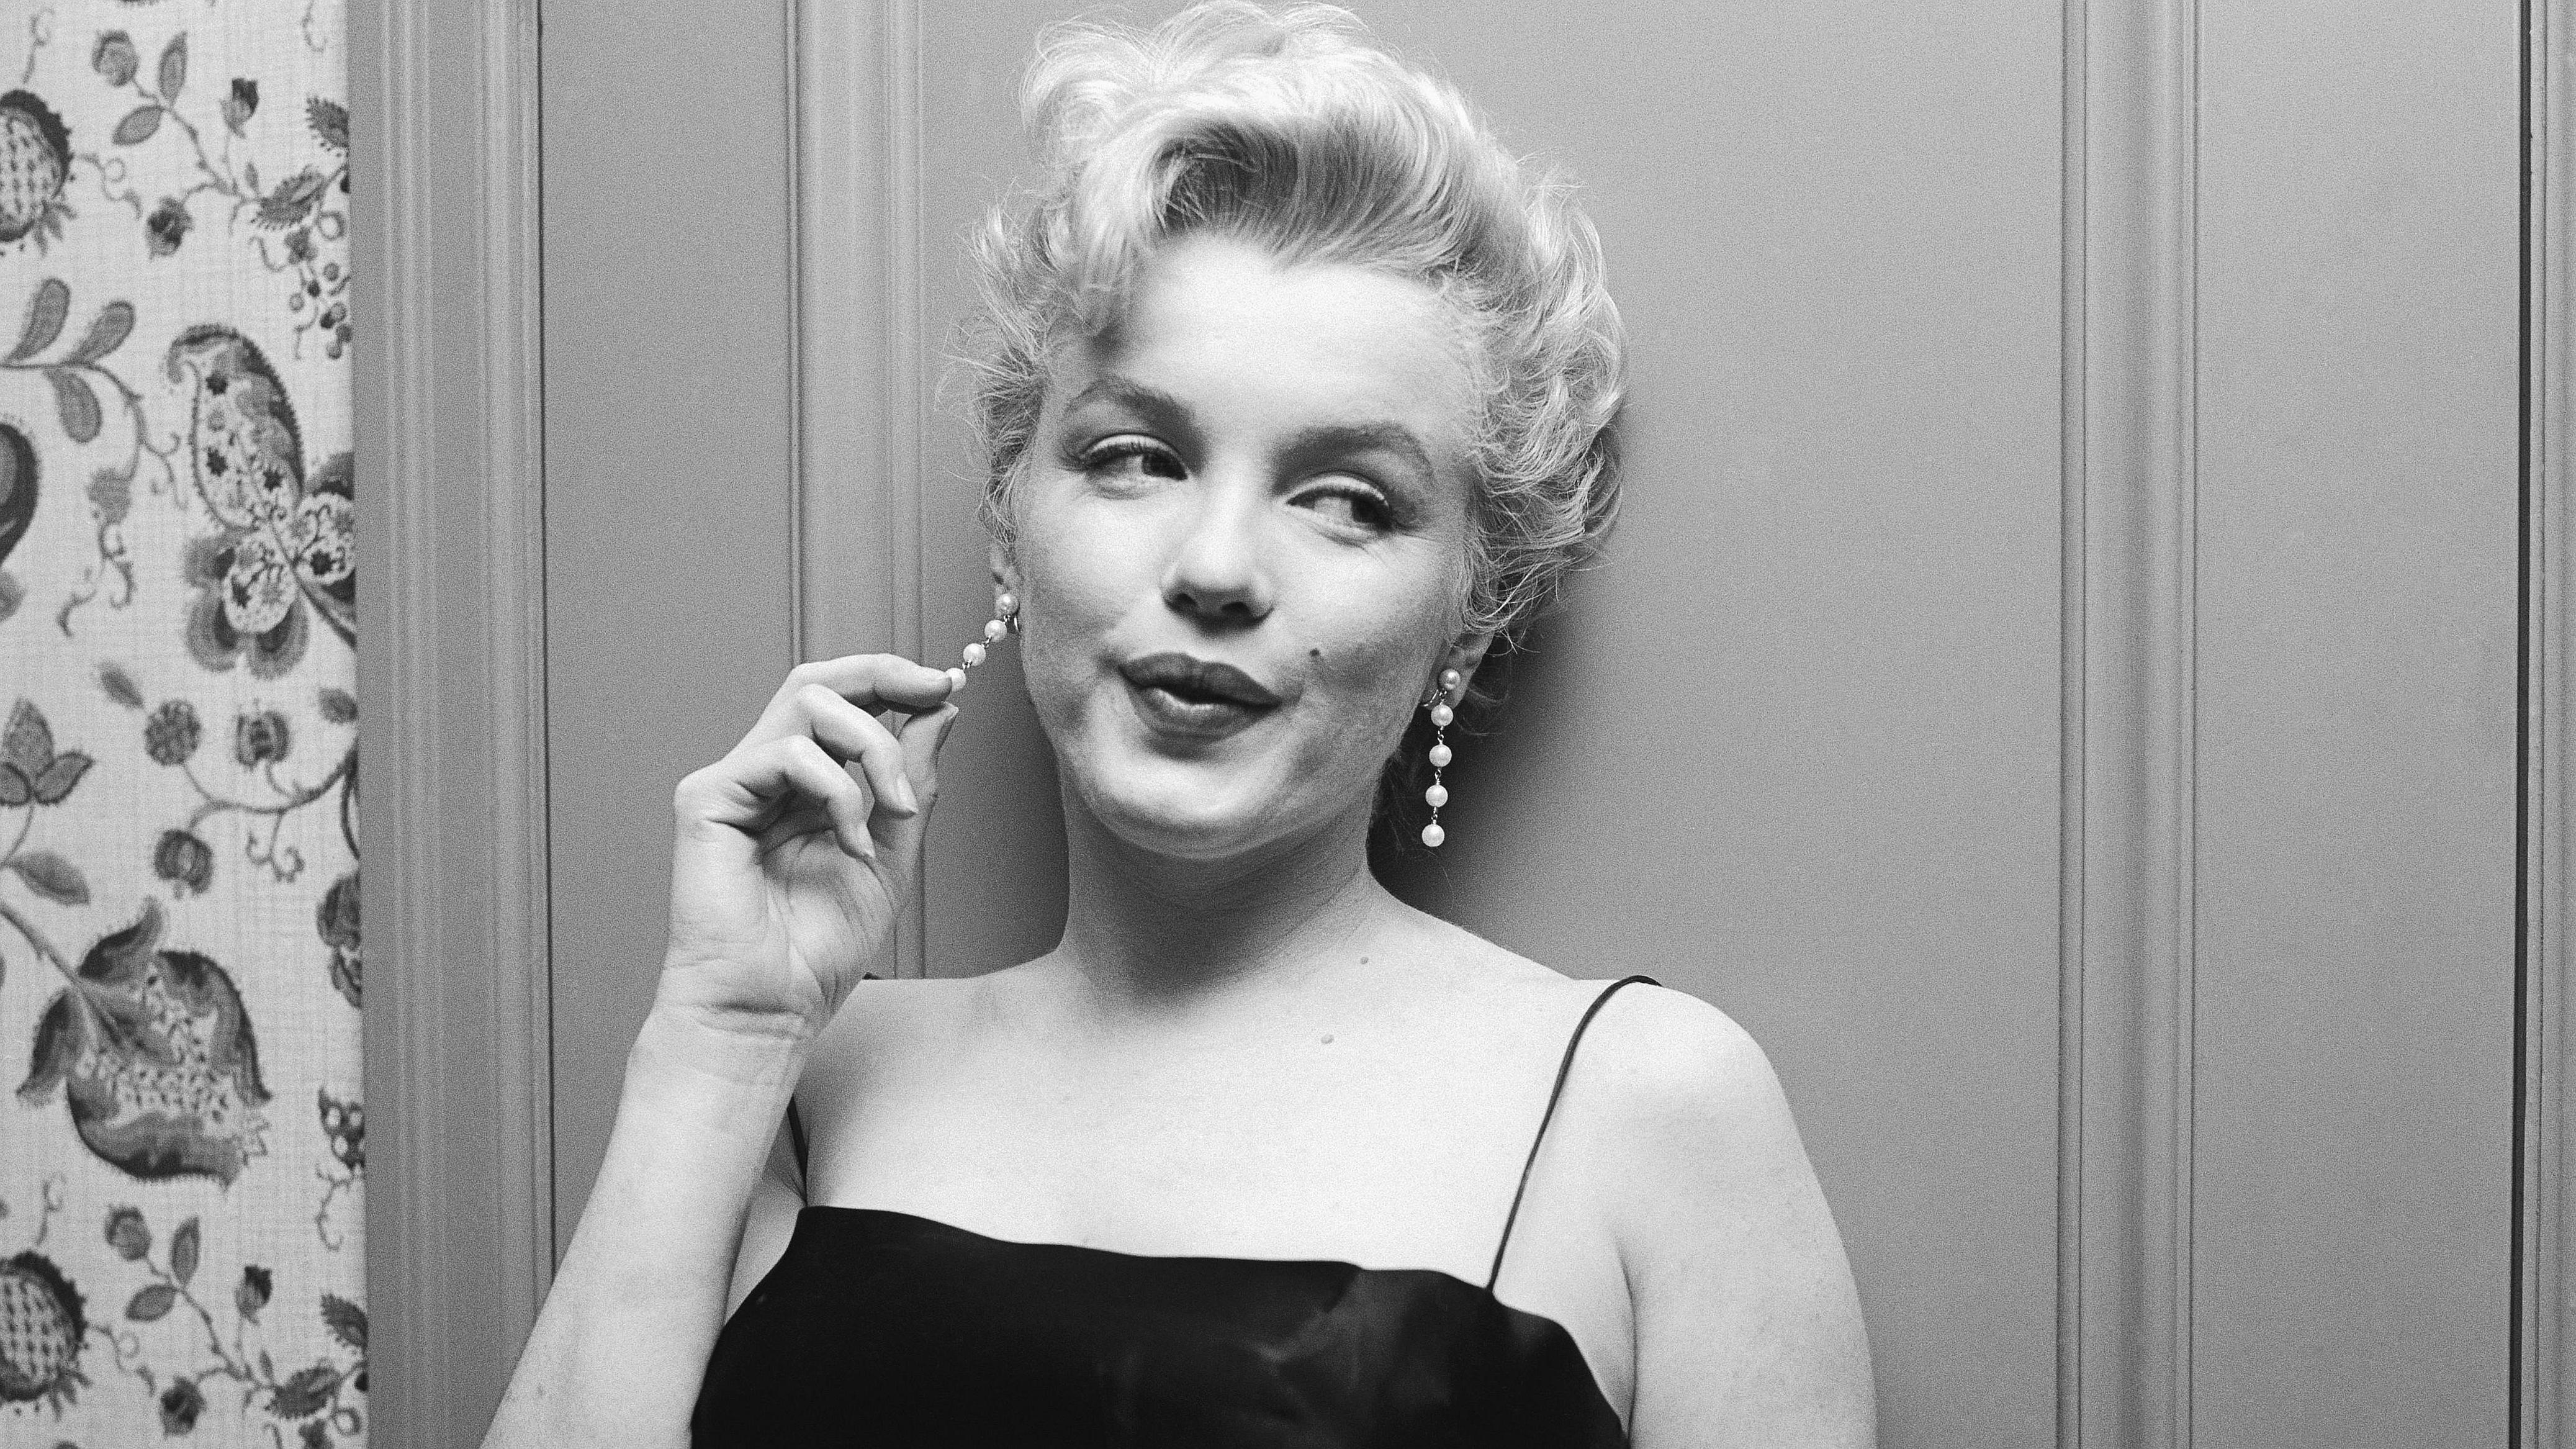 Marilyn Monroe 4k Ultra HD Duvar kağıdı | Arka plan ...